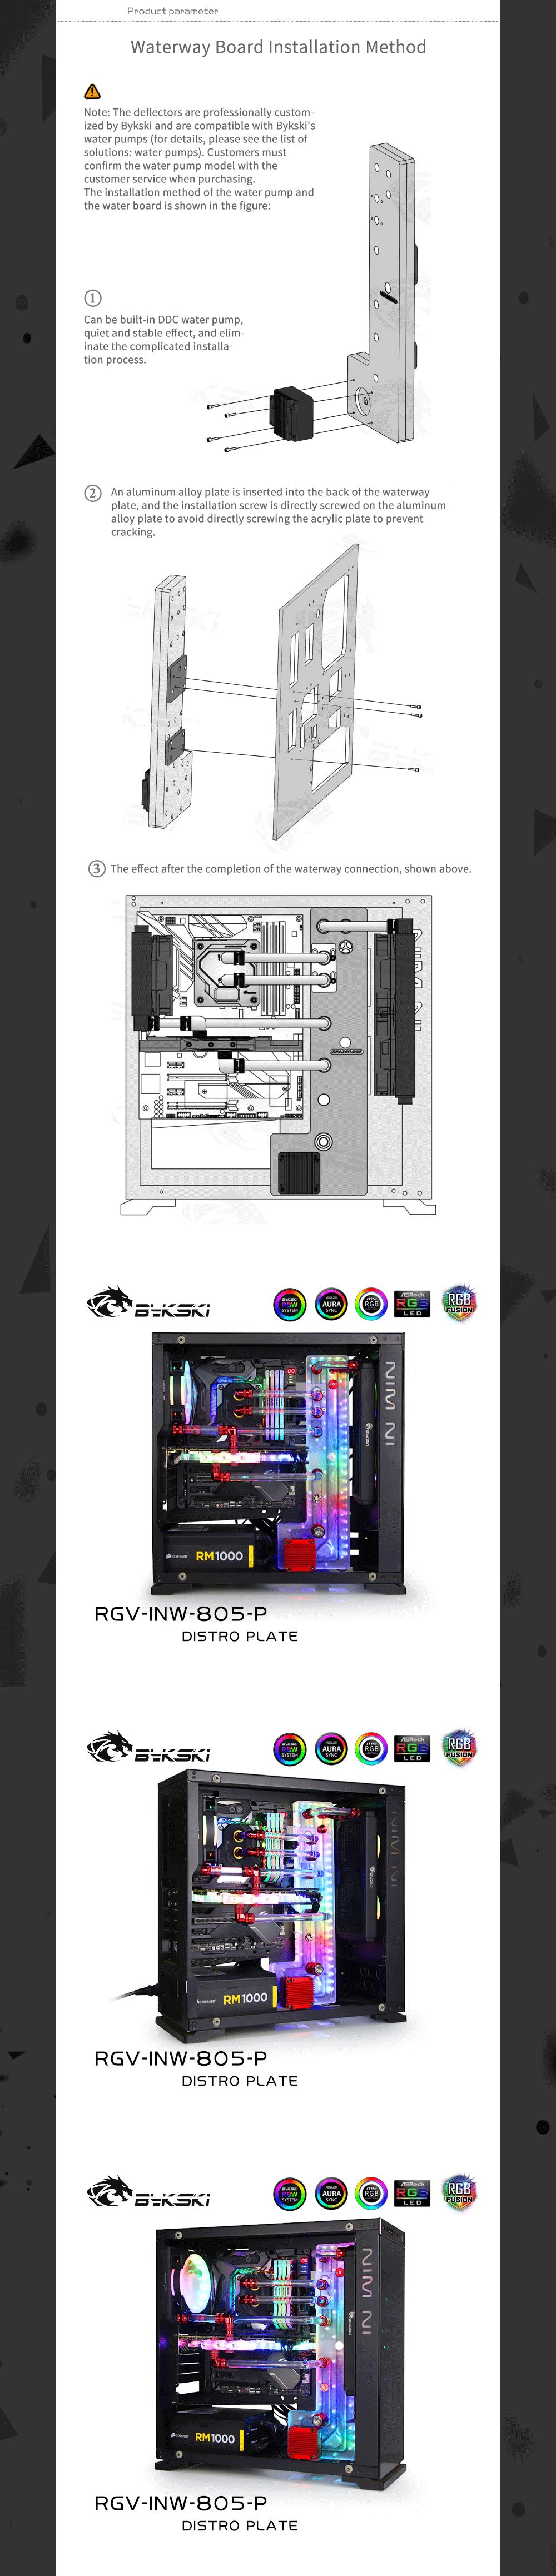 Bykski Waterway Cooling Kit For IN WIN 805 Case, 5V ARGB, For Single GPU Building, RGV-INW-805-P